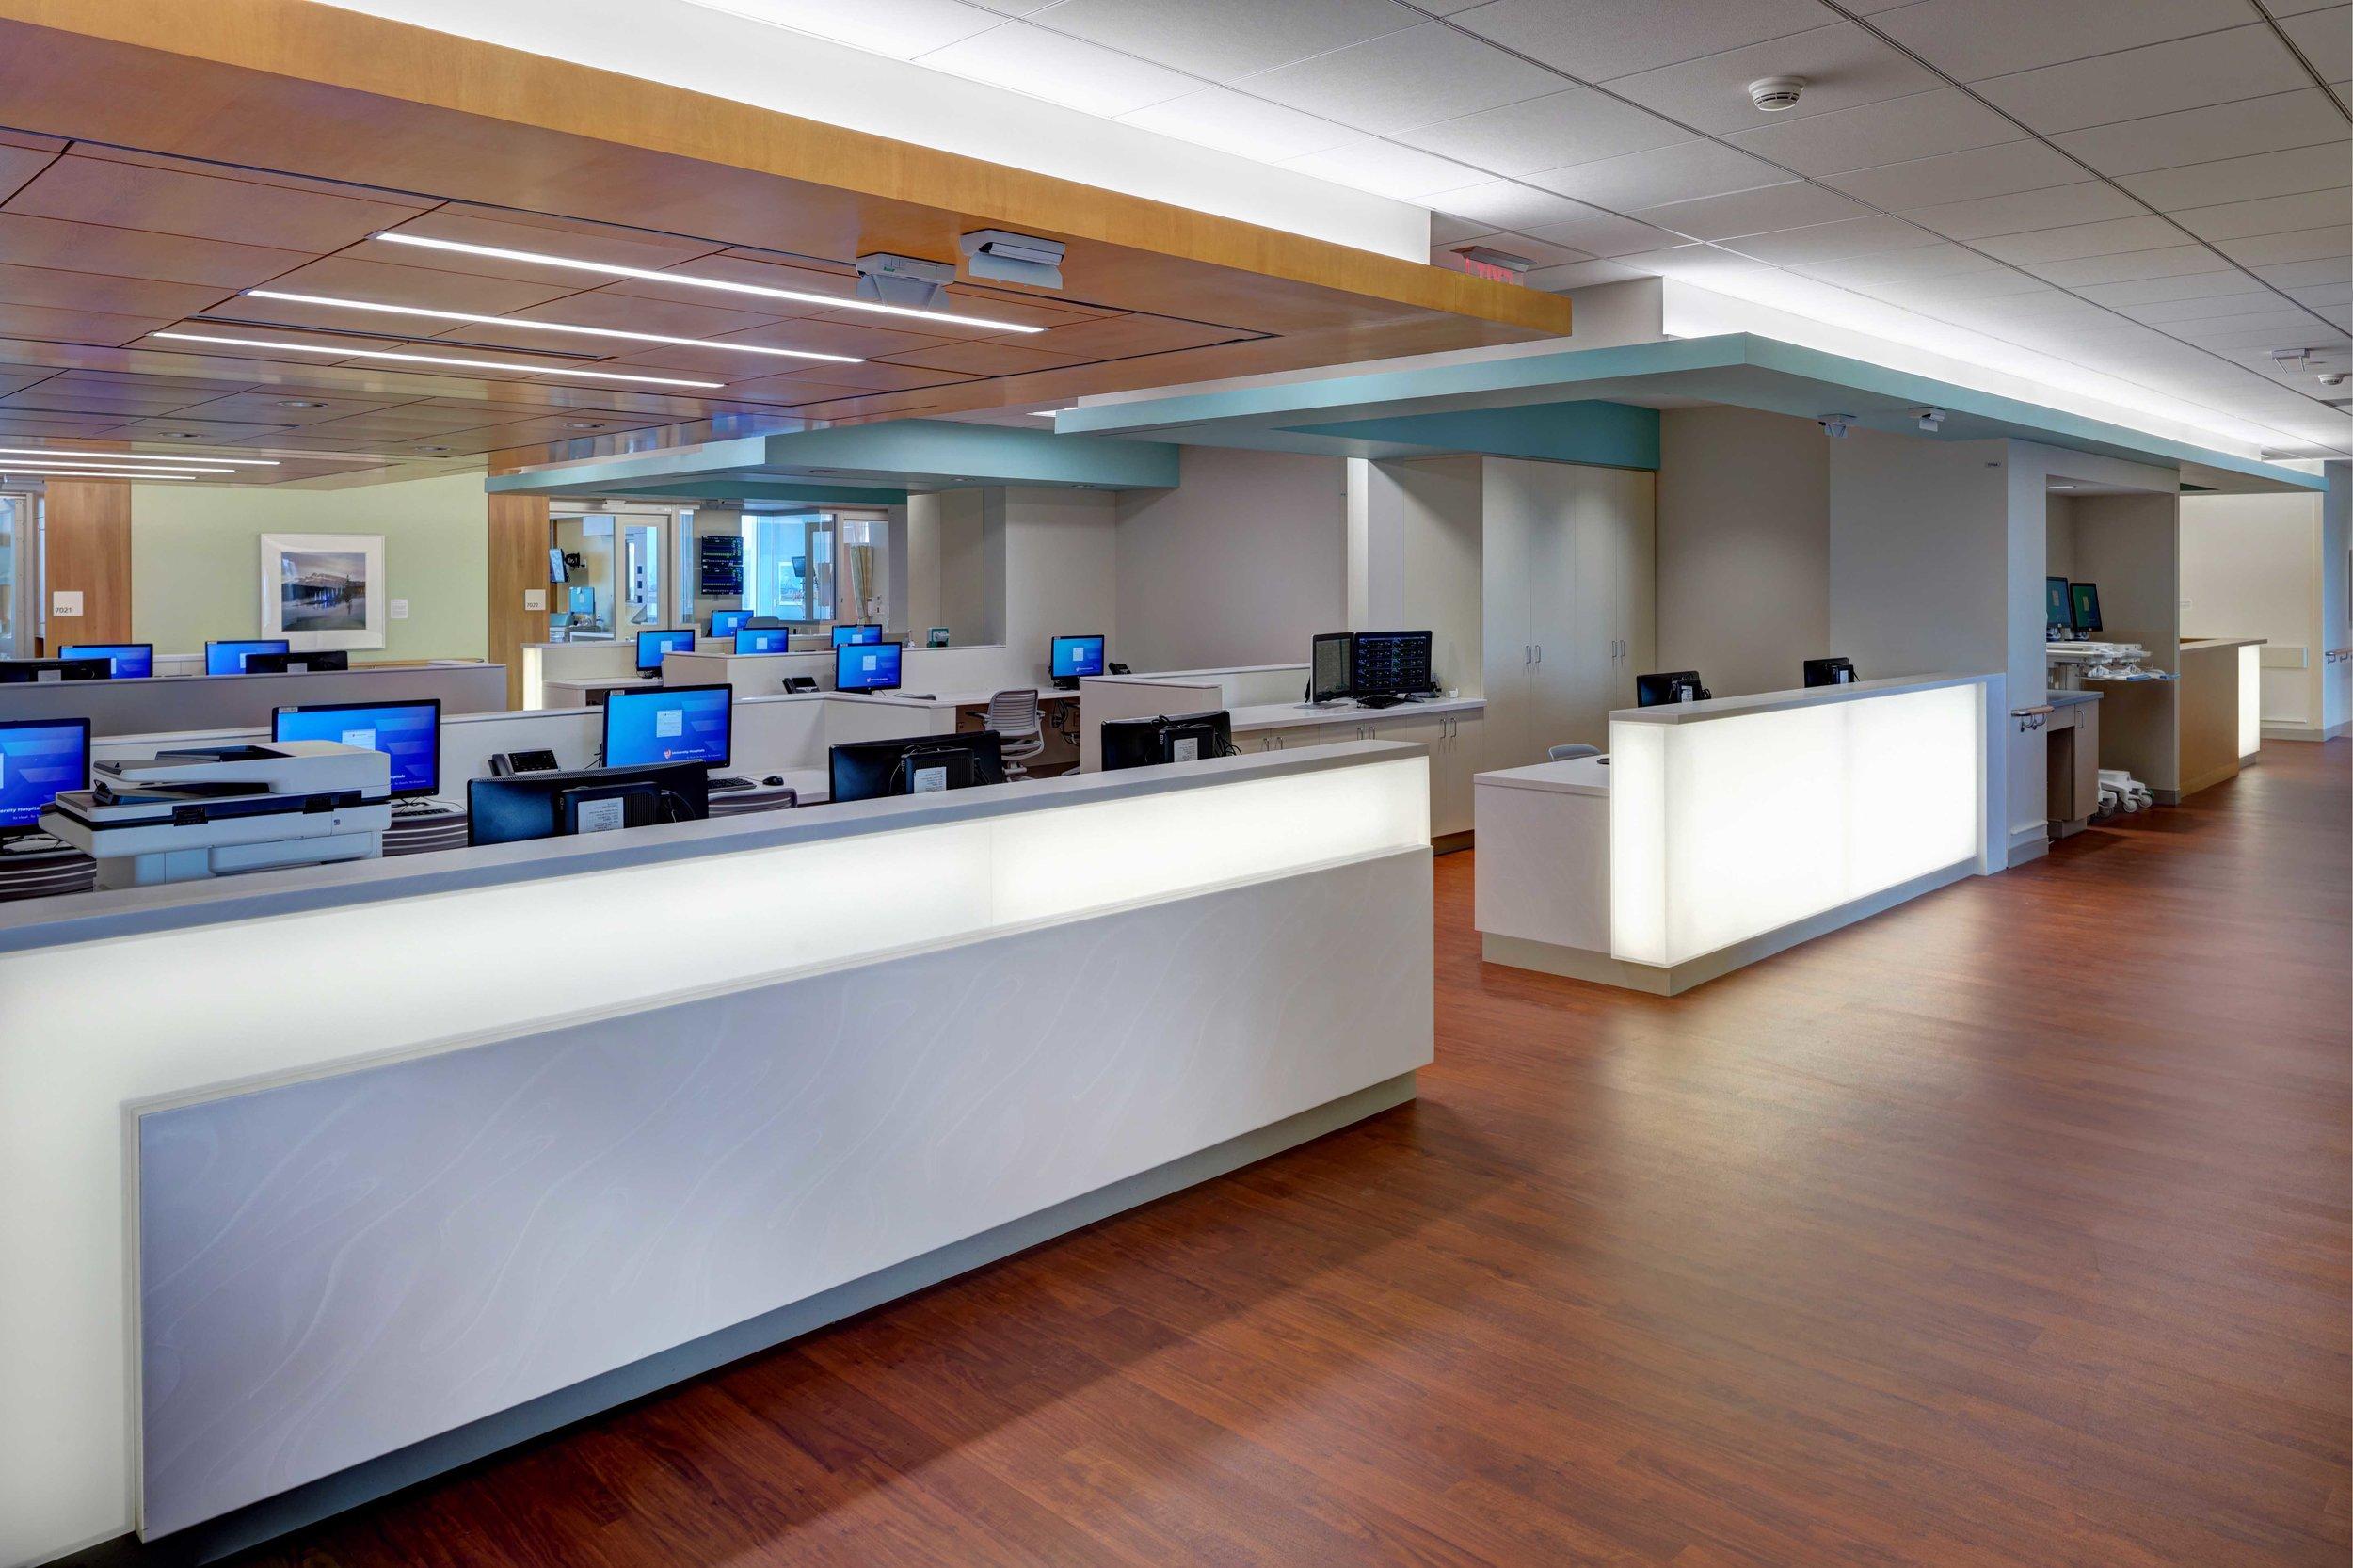 UNIVERSITY HOSPITALS CLEVELAND MEDICAL CENTER, INTENSIVE CARE UNIT